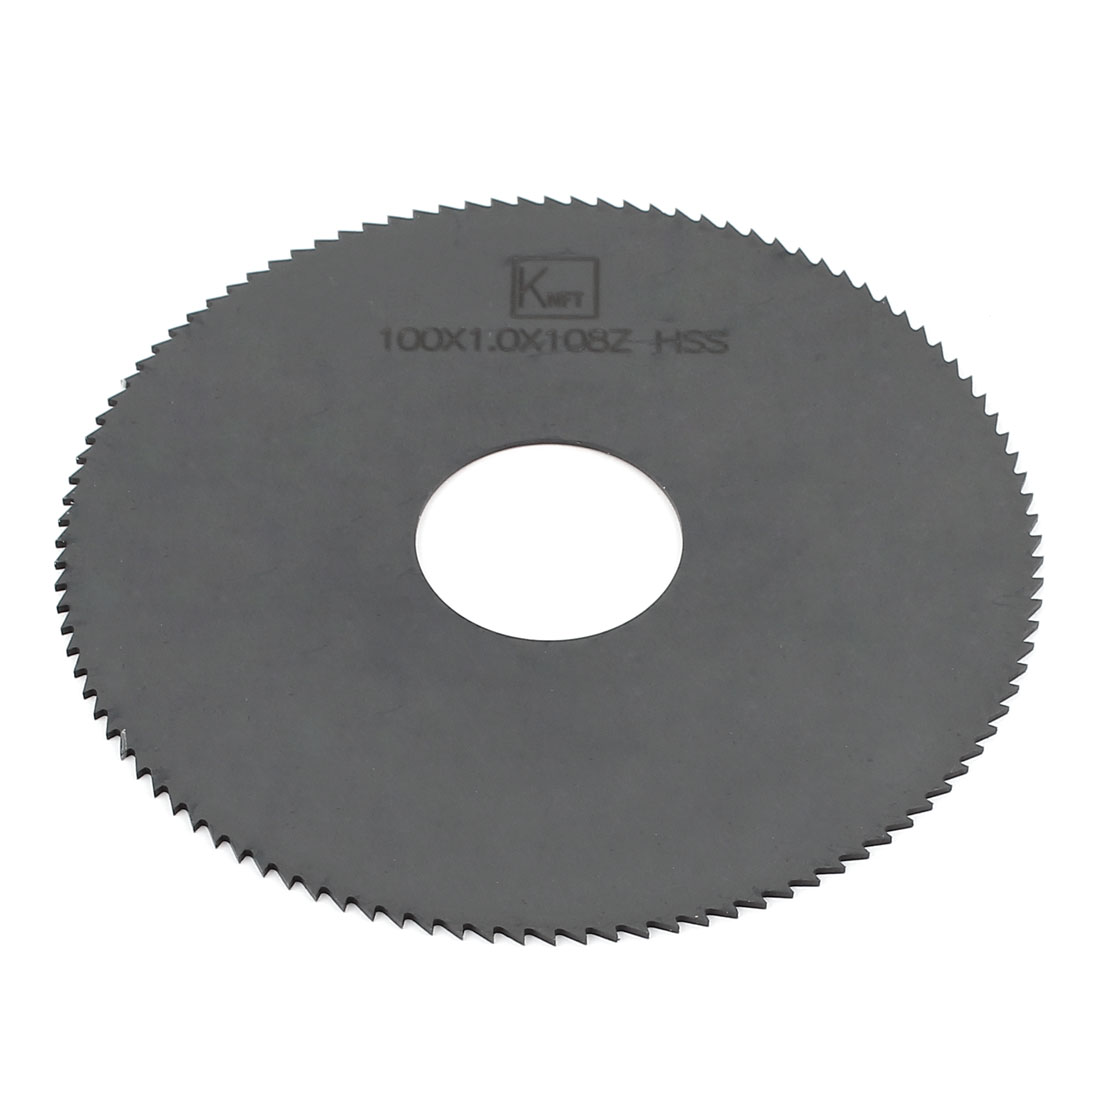 100mmx27mmx1mm 108 Teeth Gray HSS High Speed Steel Slitting Saw Cutter Cutting Tool